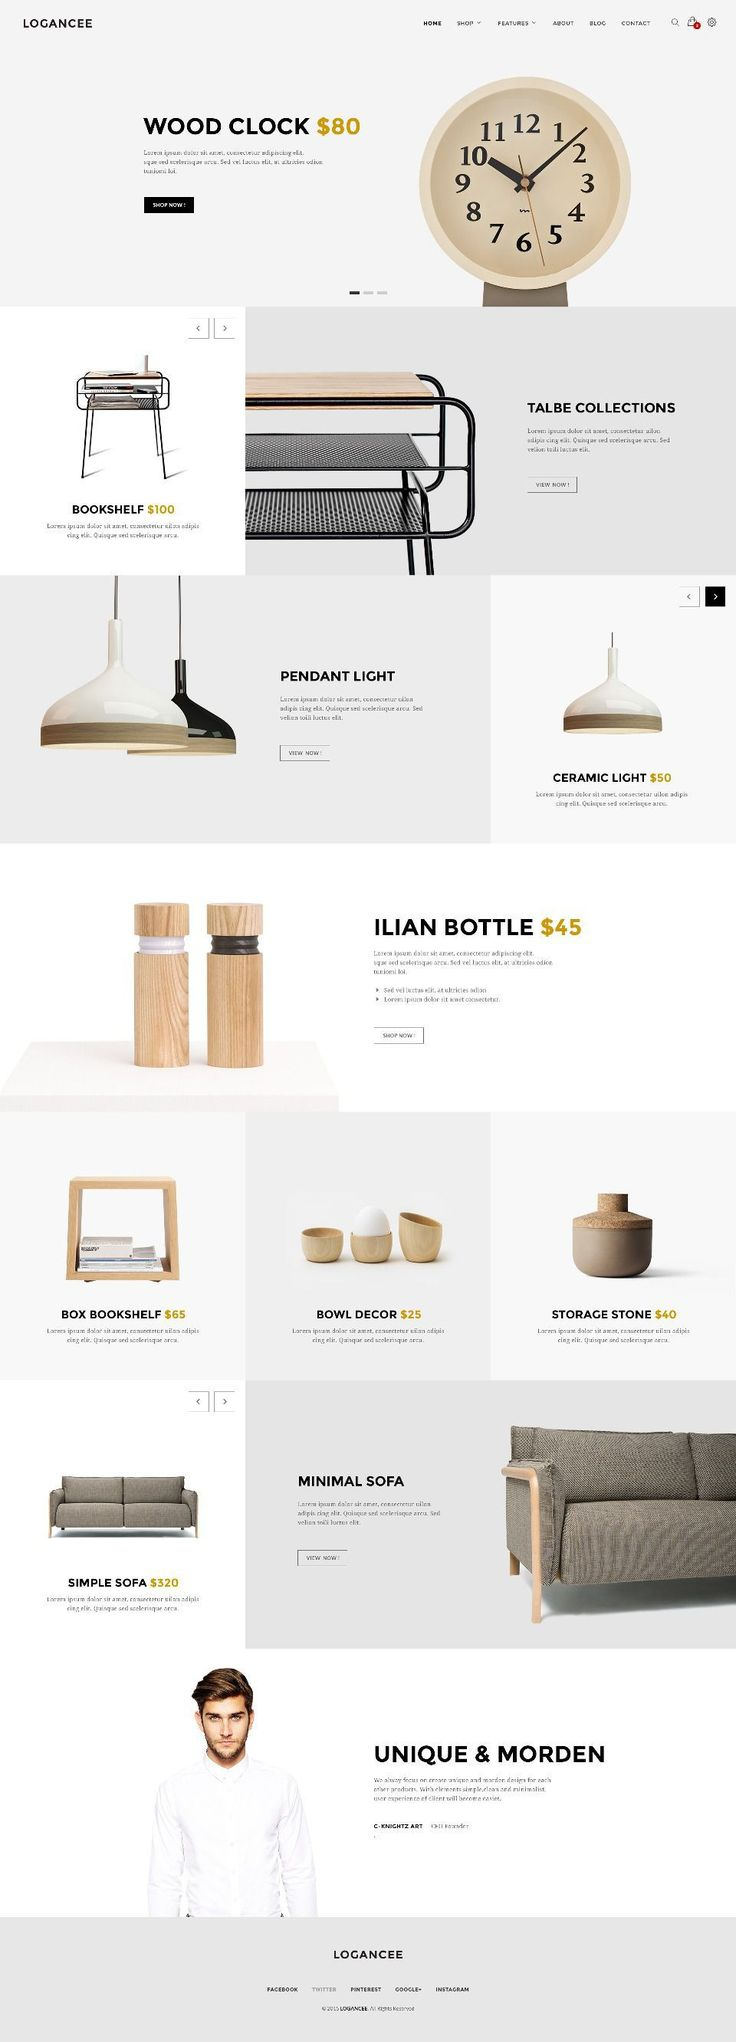 Logancee-web-design-inspiration-part3-1.jpg (960×2664)